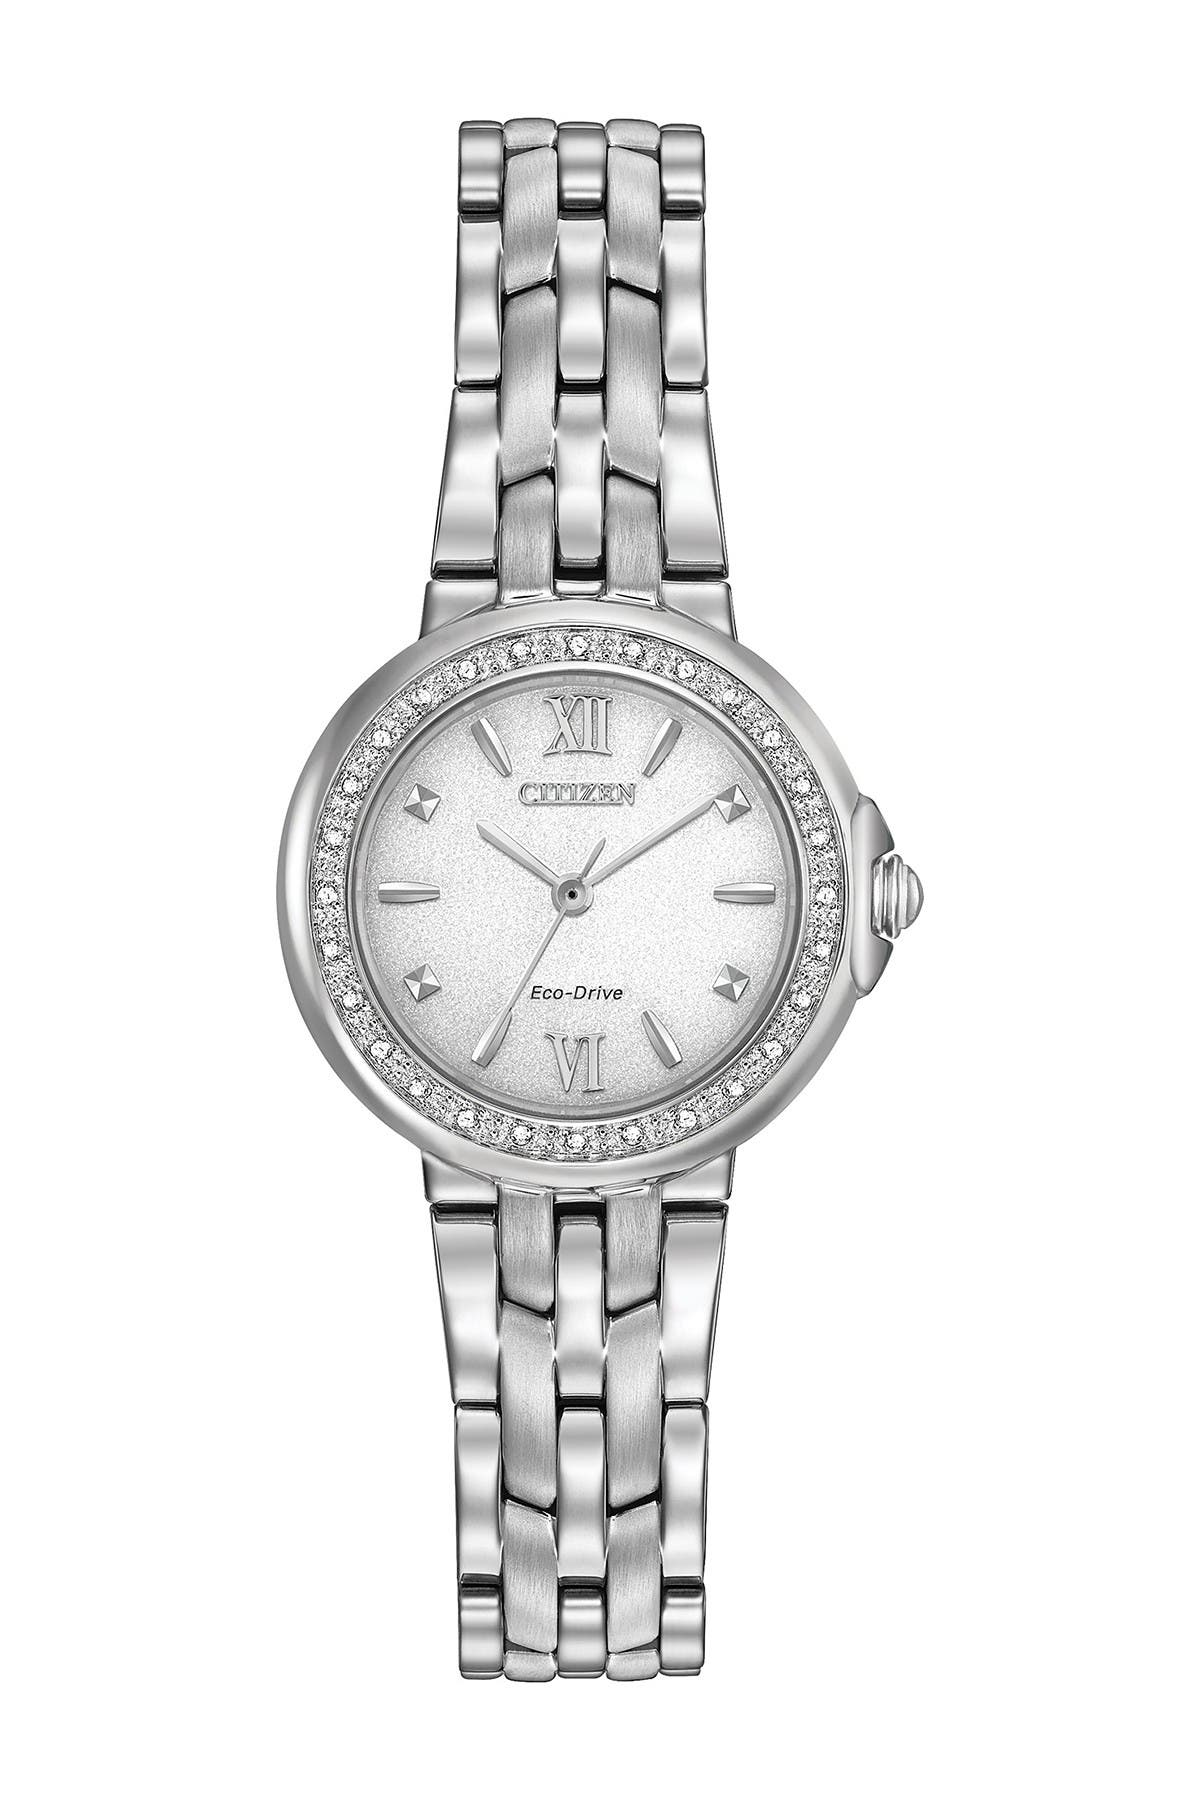 Image of Citizen Women's Eco-Drive Stainless Steel Diamond Bracelet Watch, 28mm